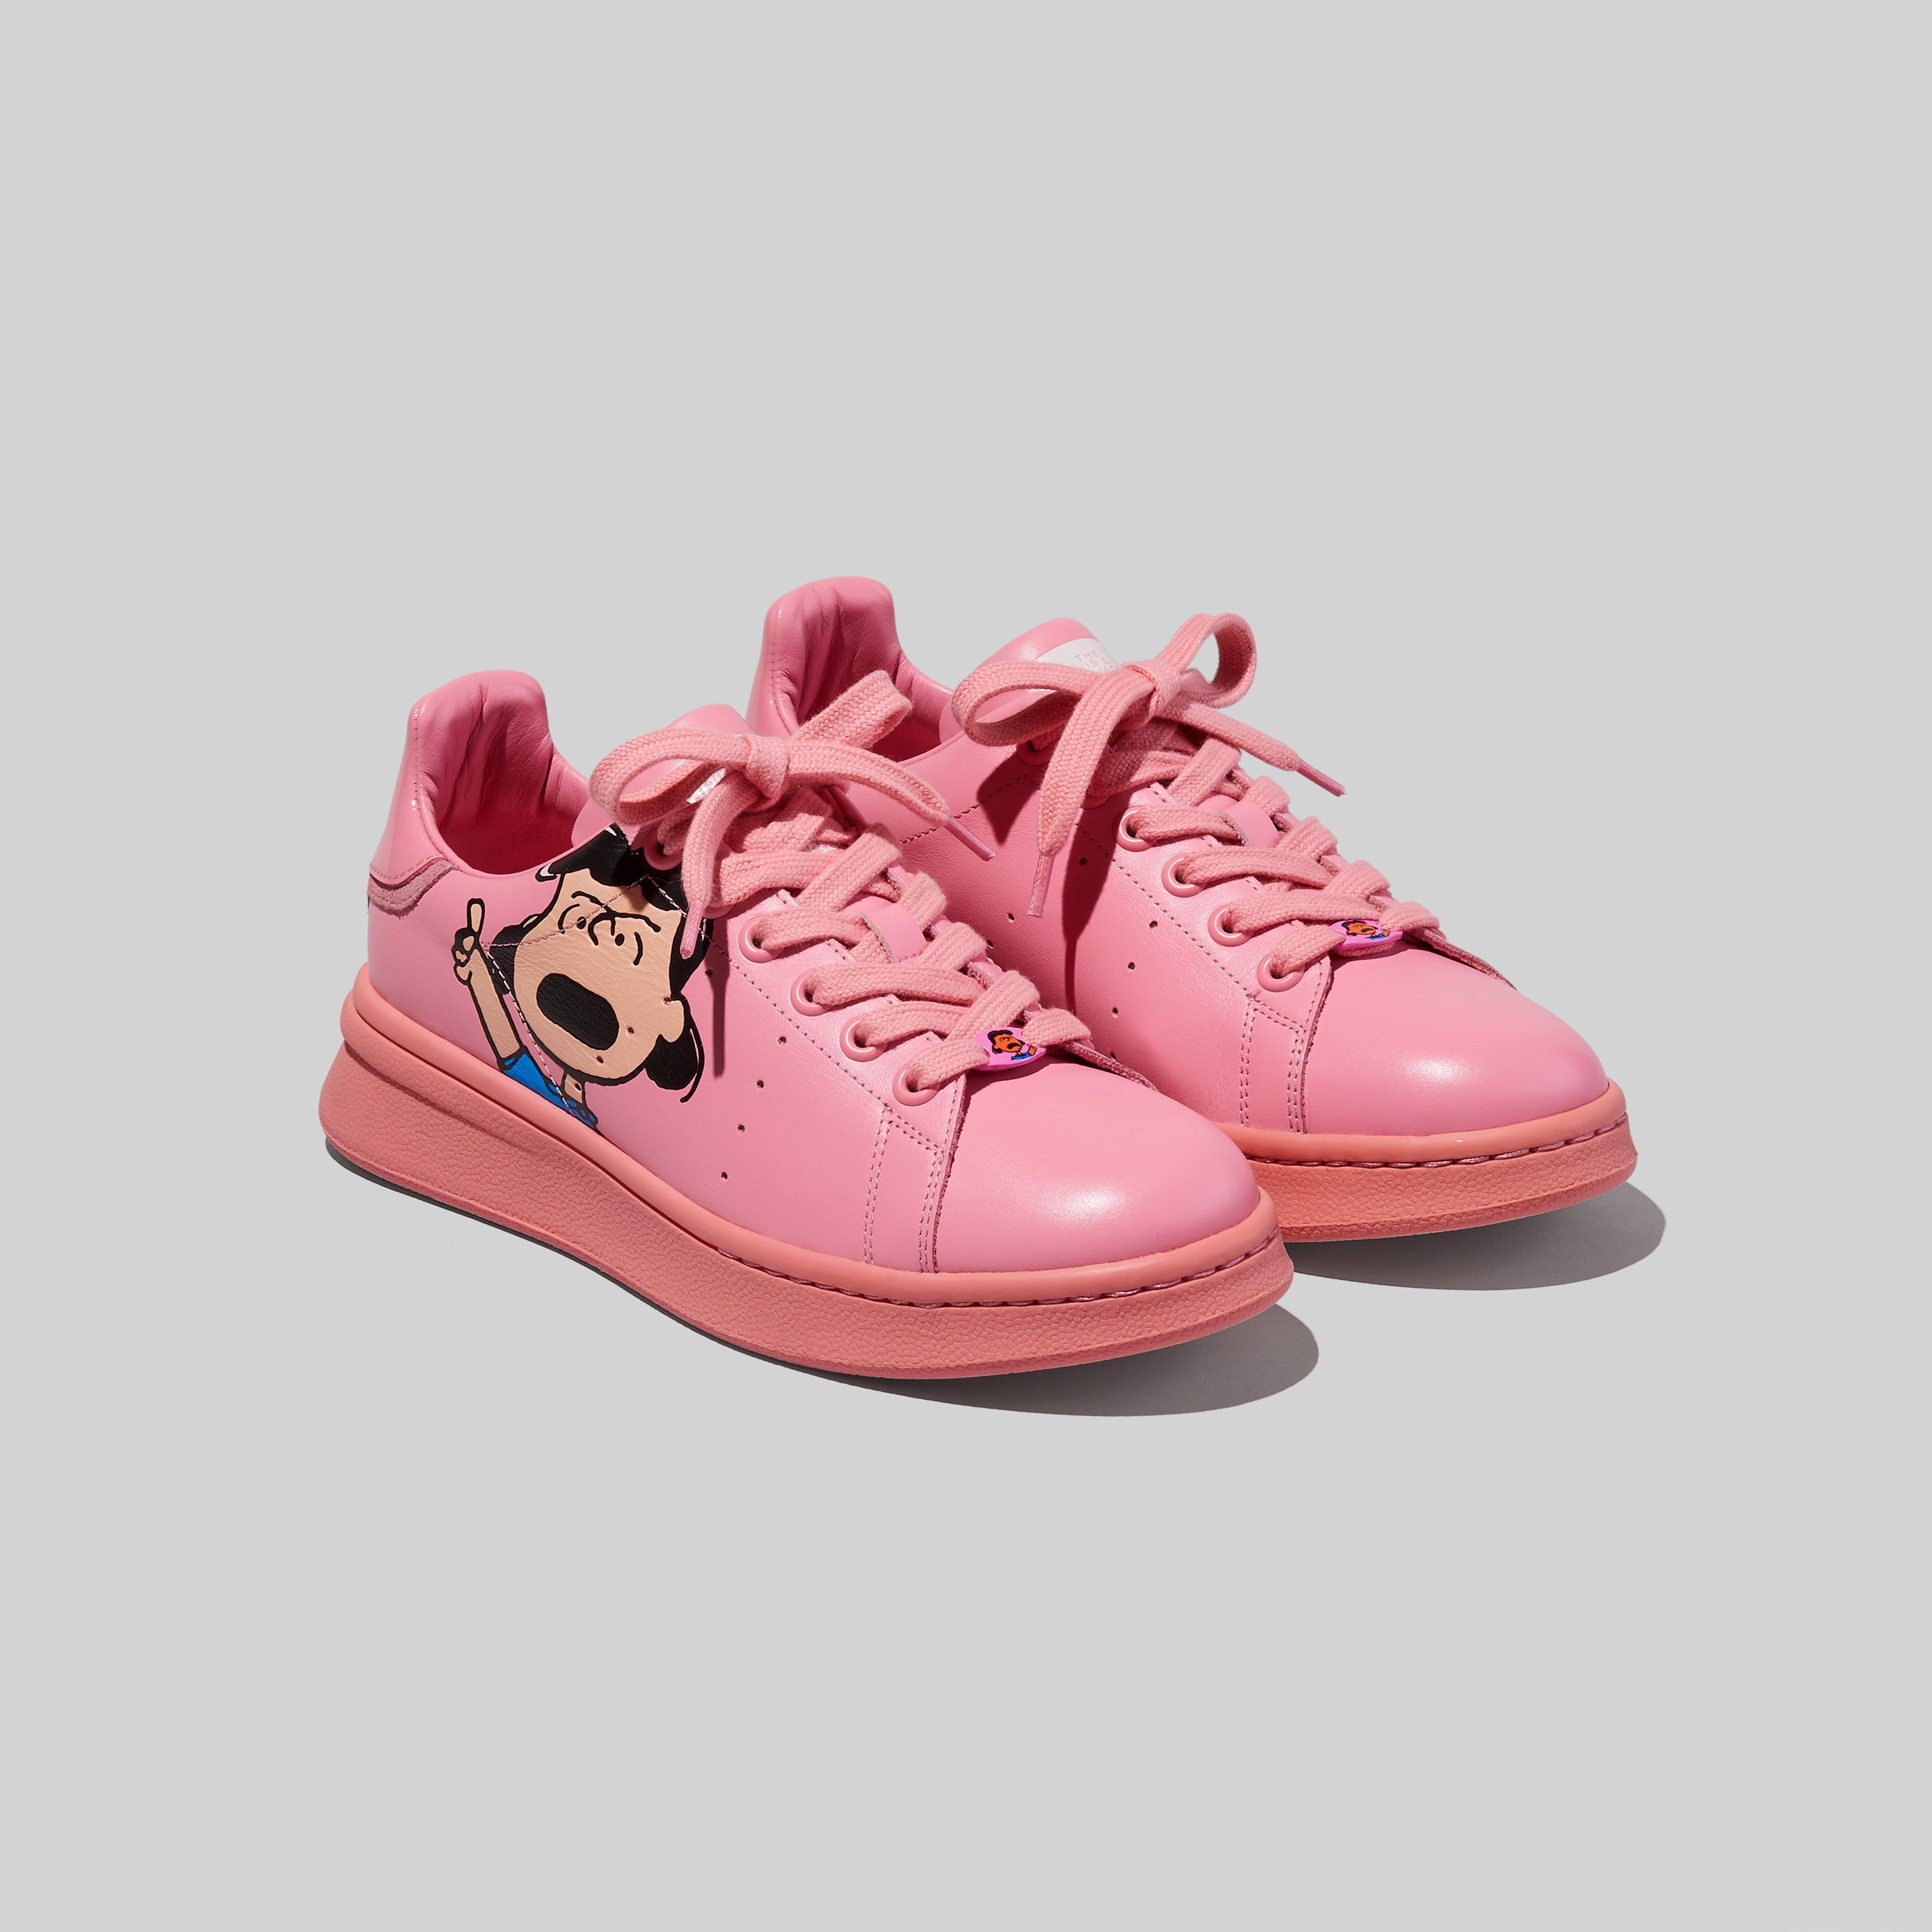 Marc Jacobs Peanuts x The Tennis Shoe Marc Jacobs